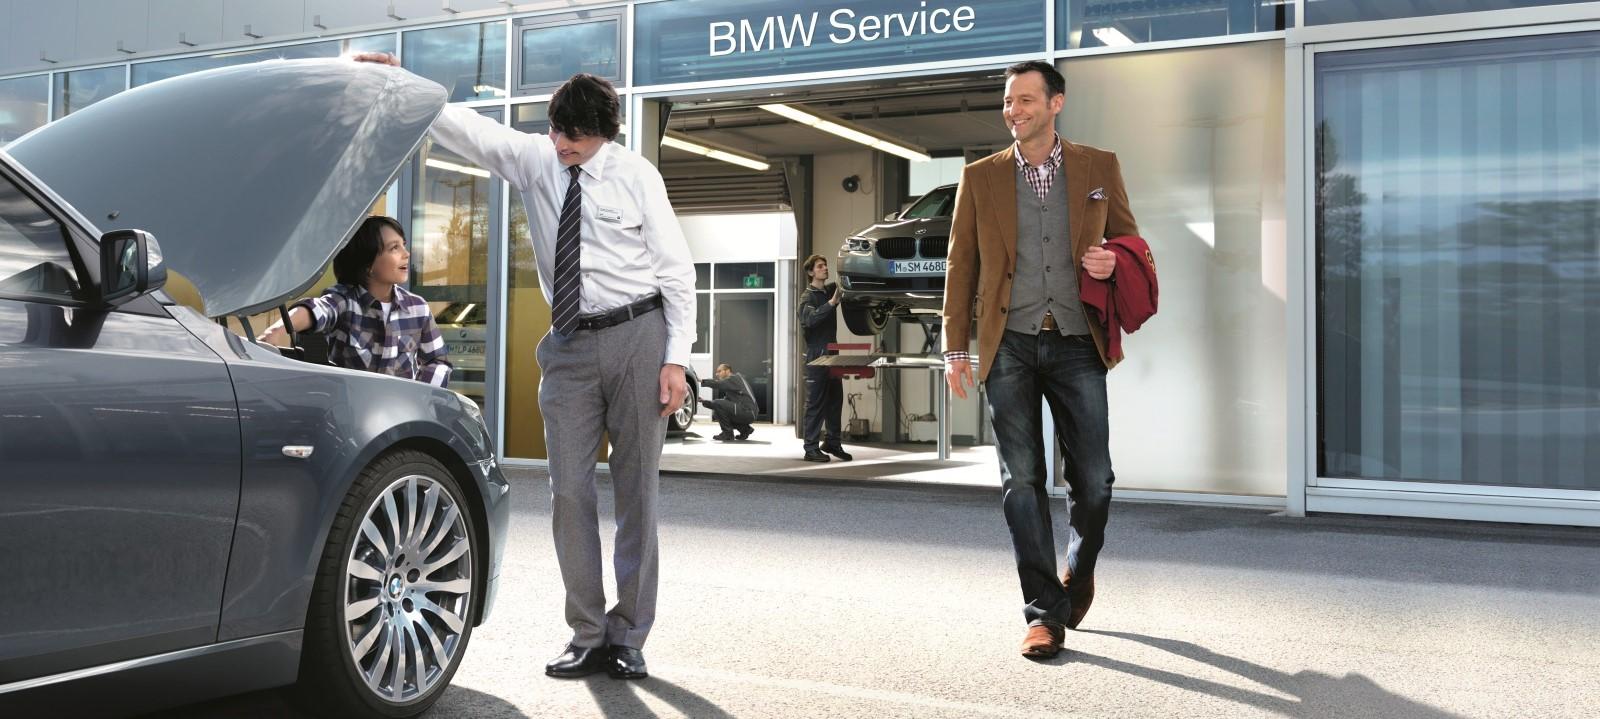 Used Car Warranty Guidelines Dick Lovett Bmw Bmw